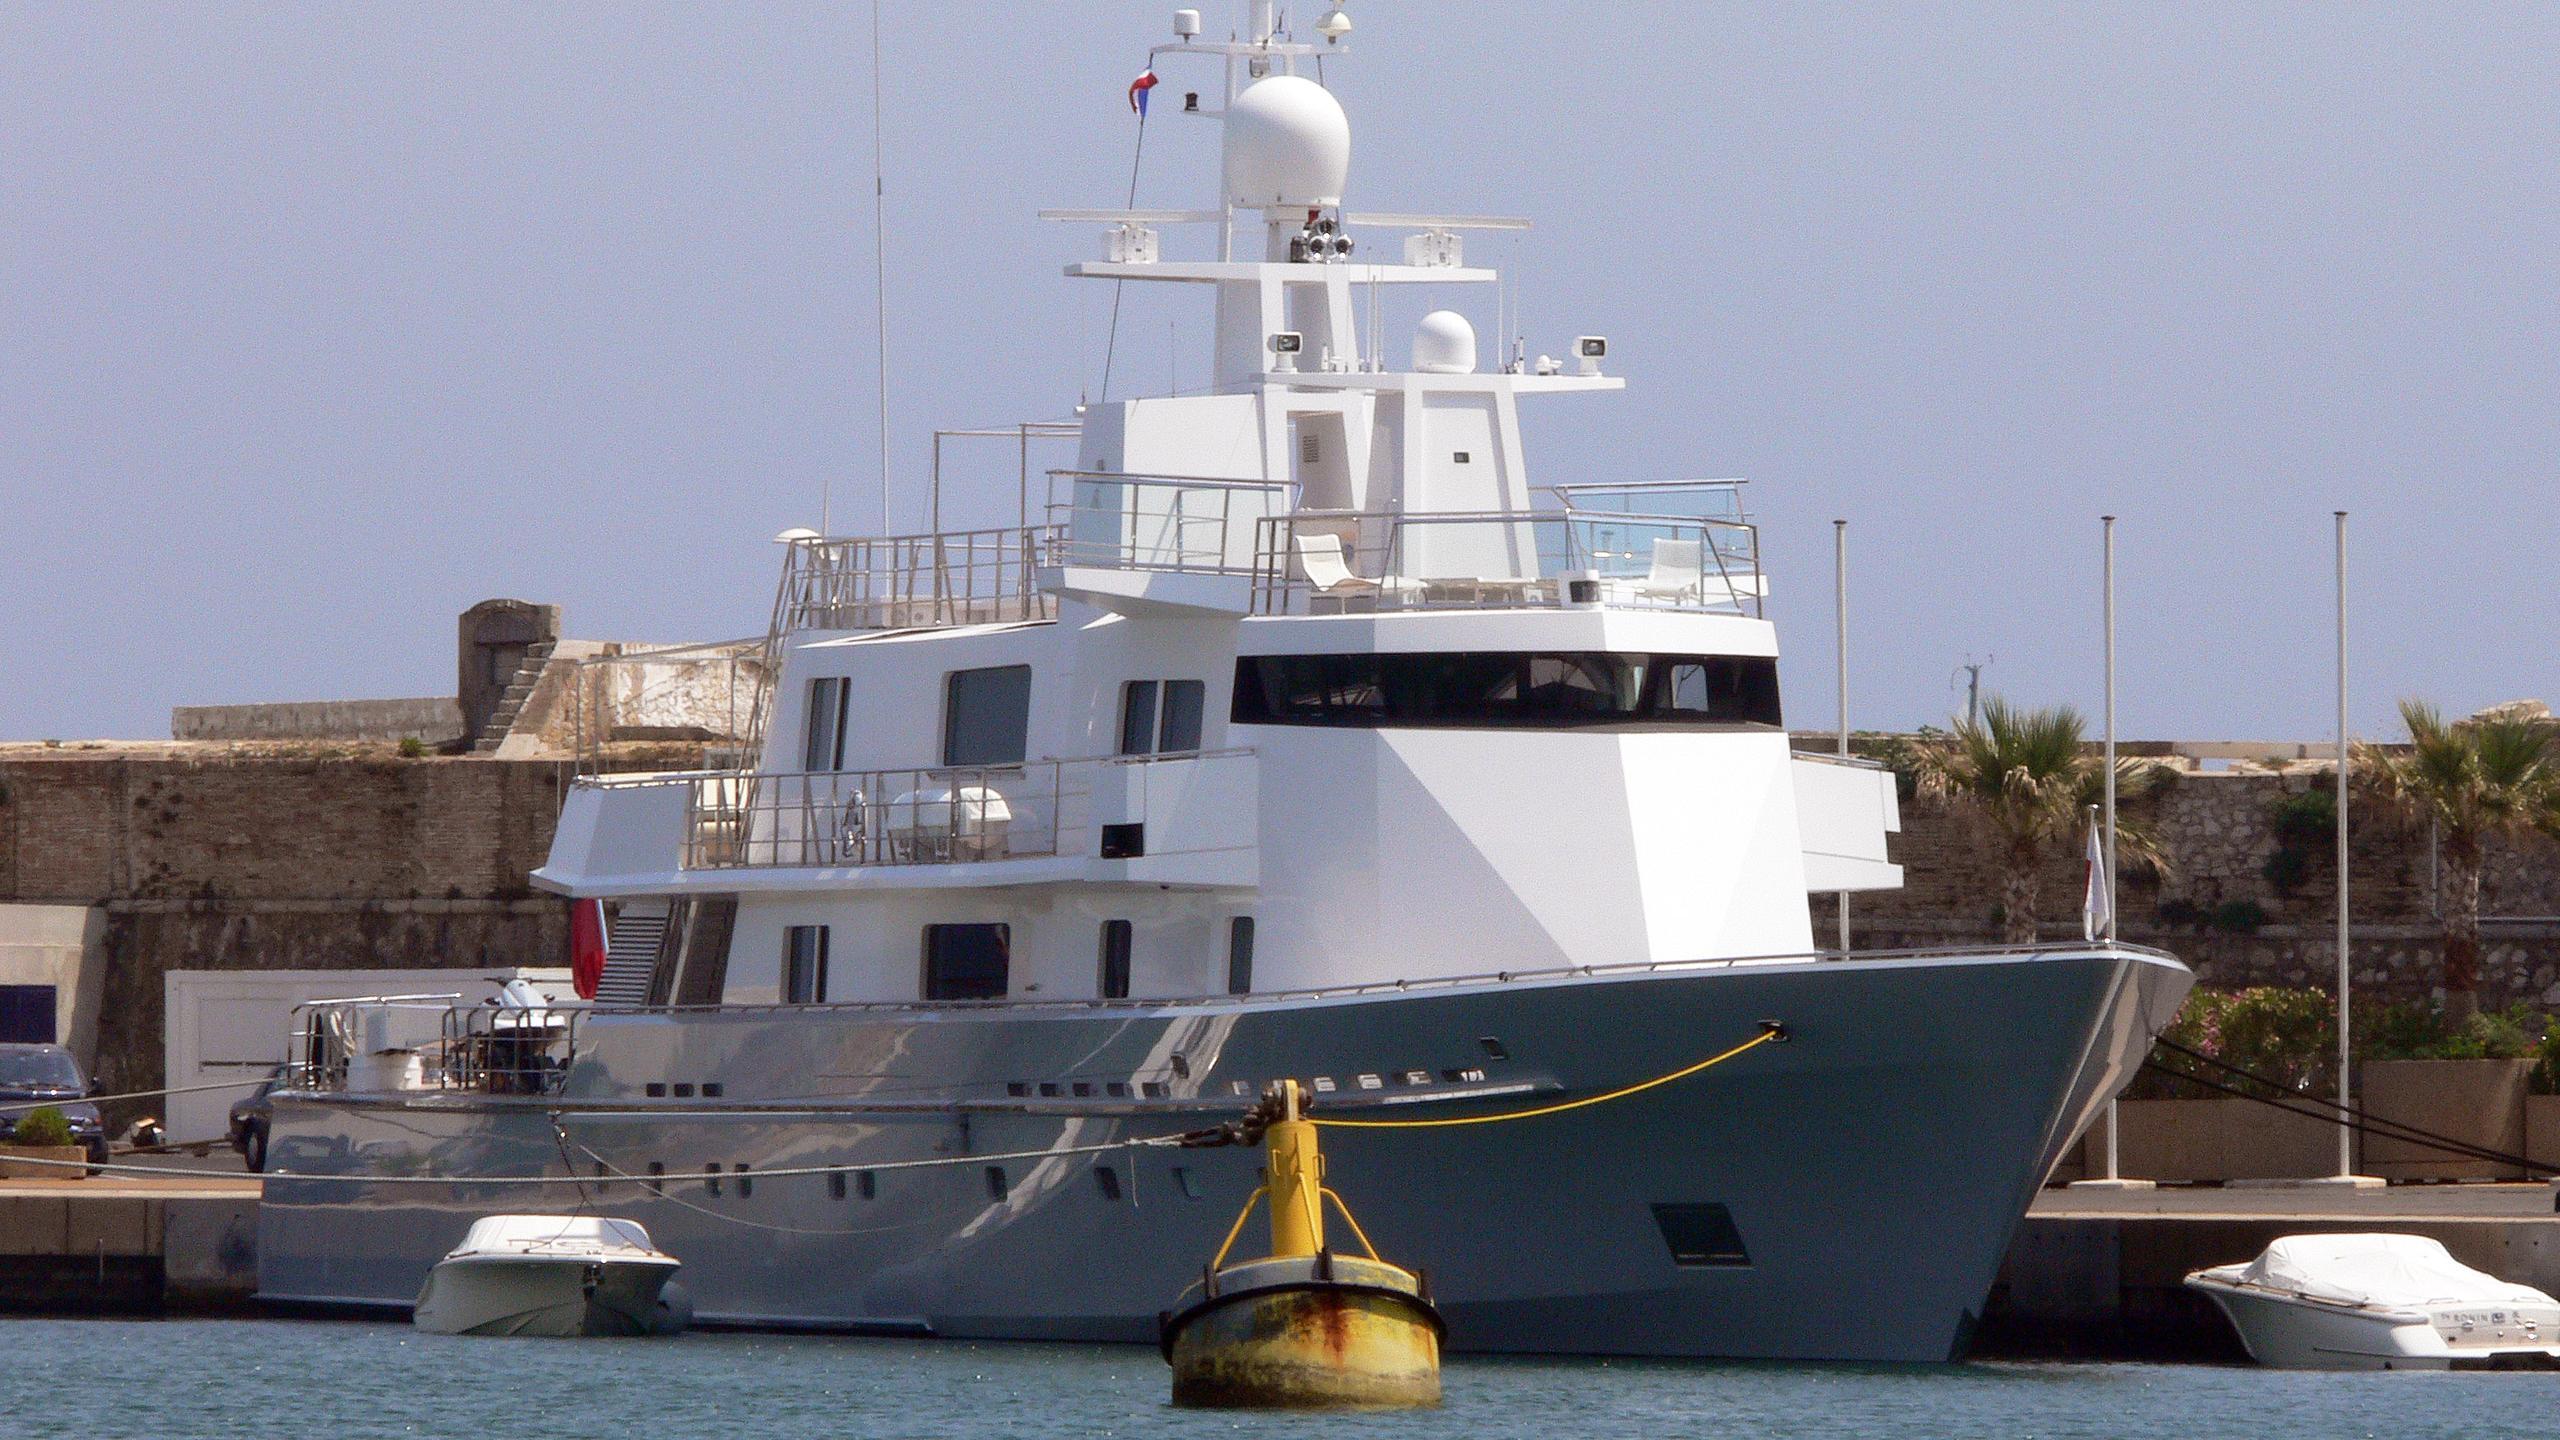 ronin-motor-yacht-lurssen-1993-58m-bow